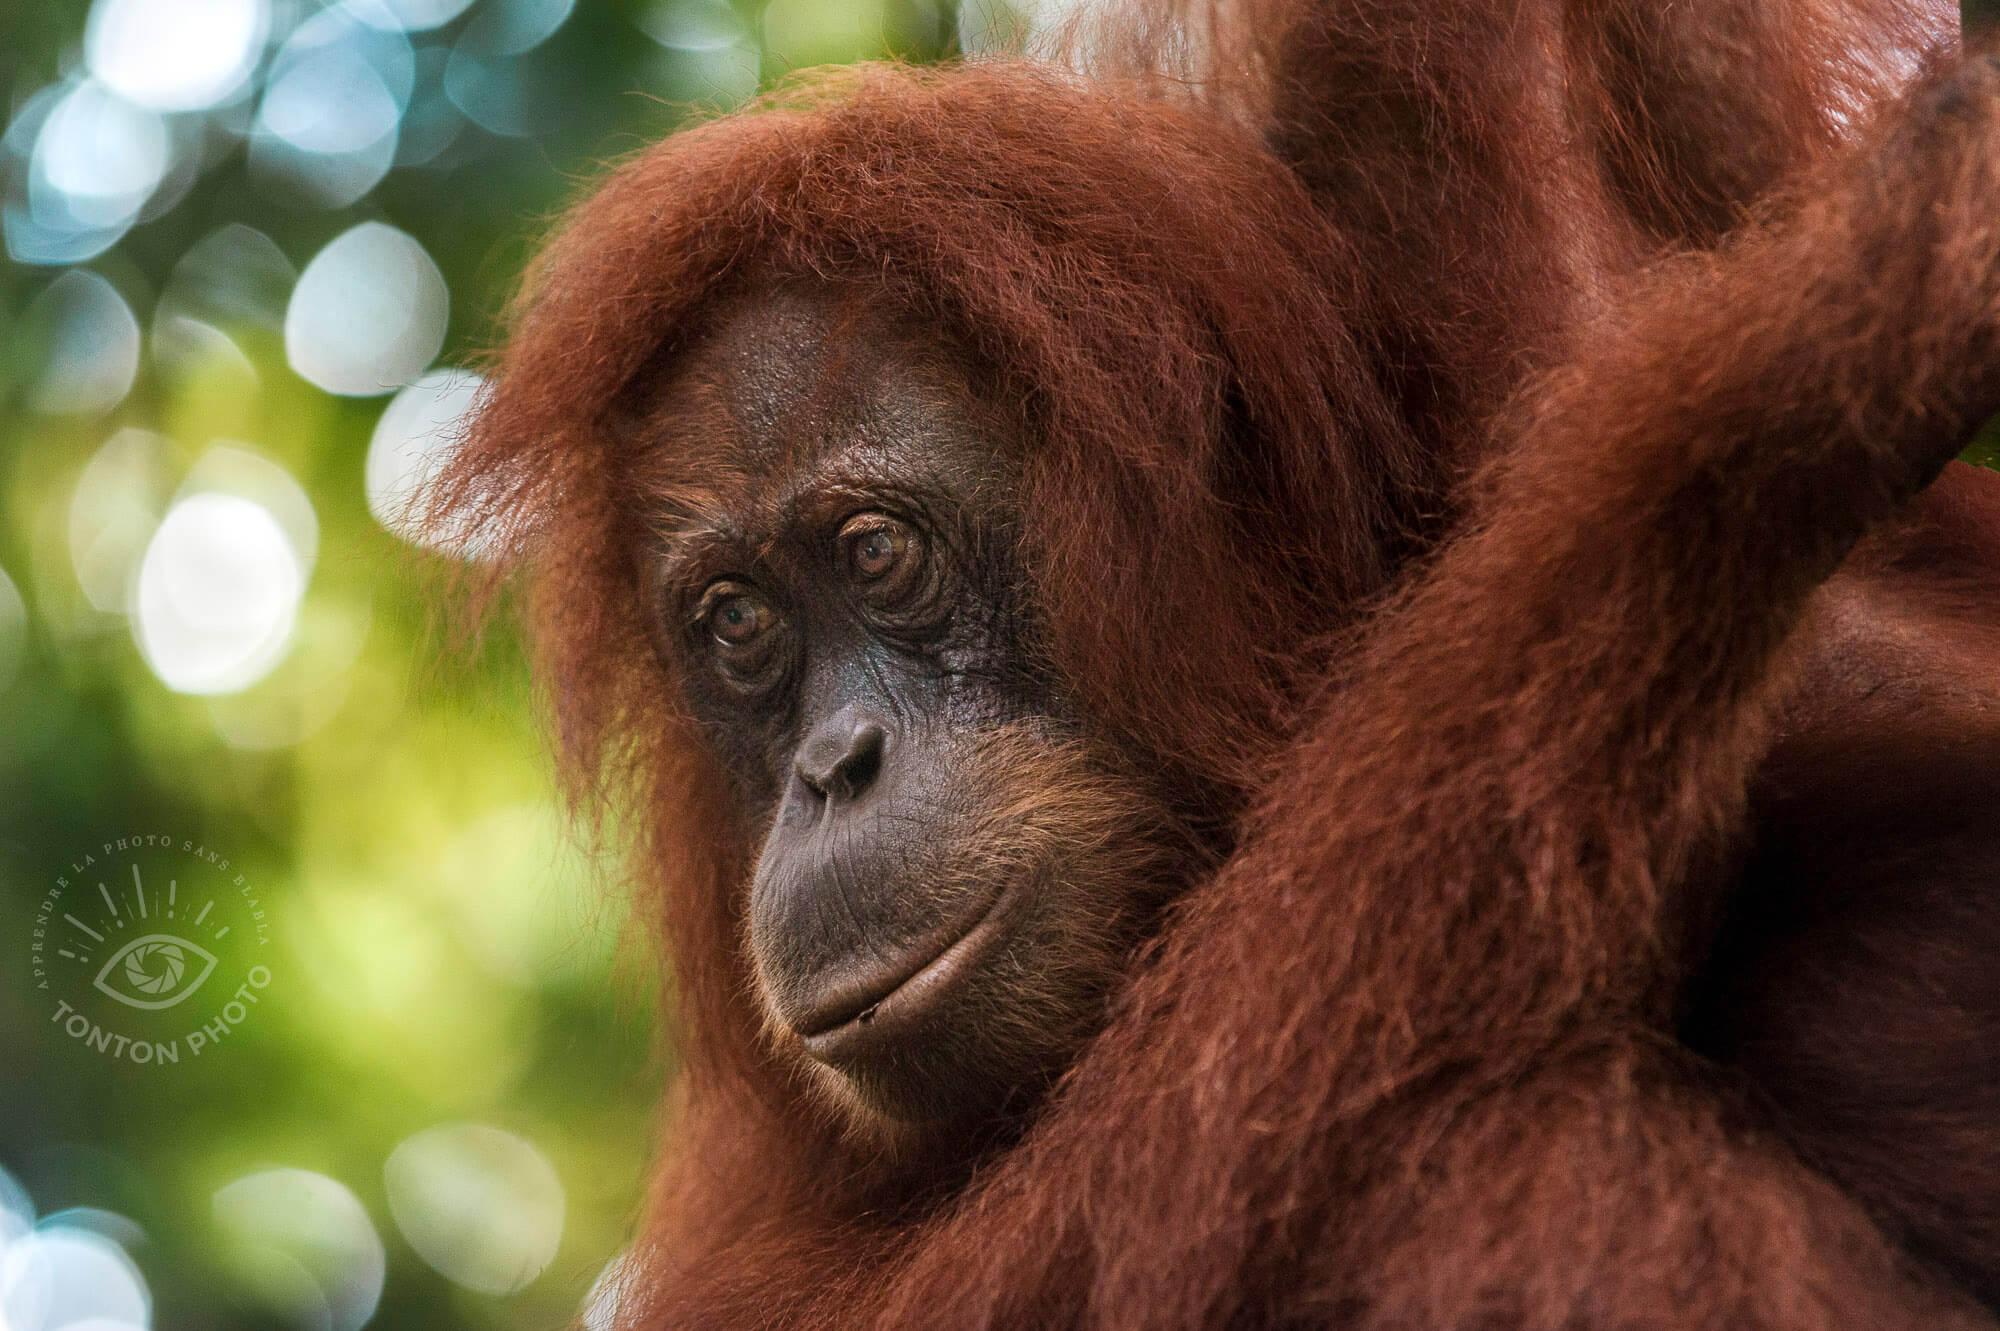 Portrait de femelle orang-outan. Bukit Lawang, Sumatra, Indonésie © Clément Racineux / Tonton Photo